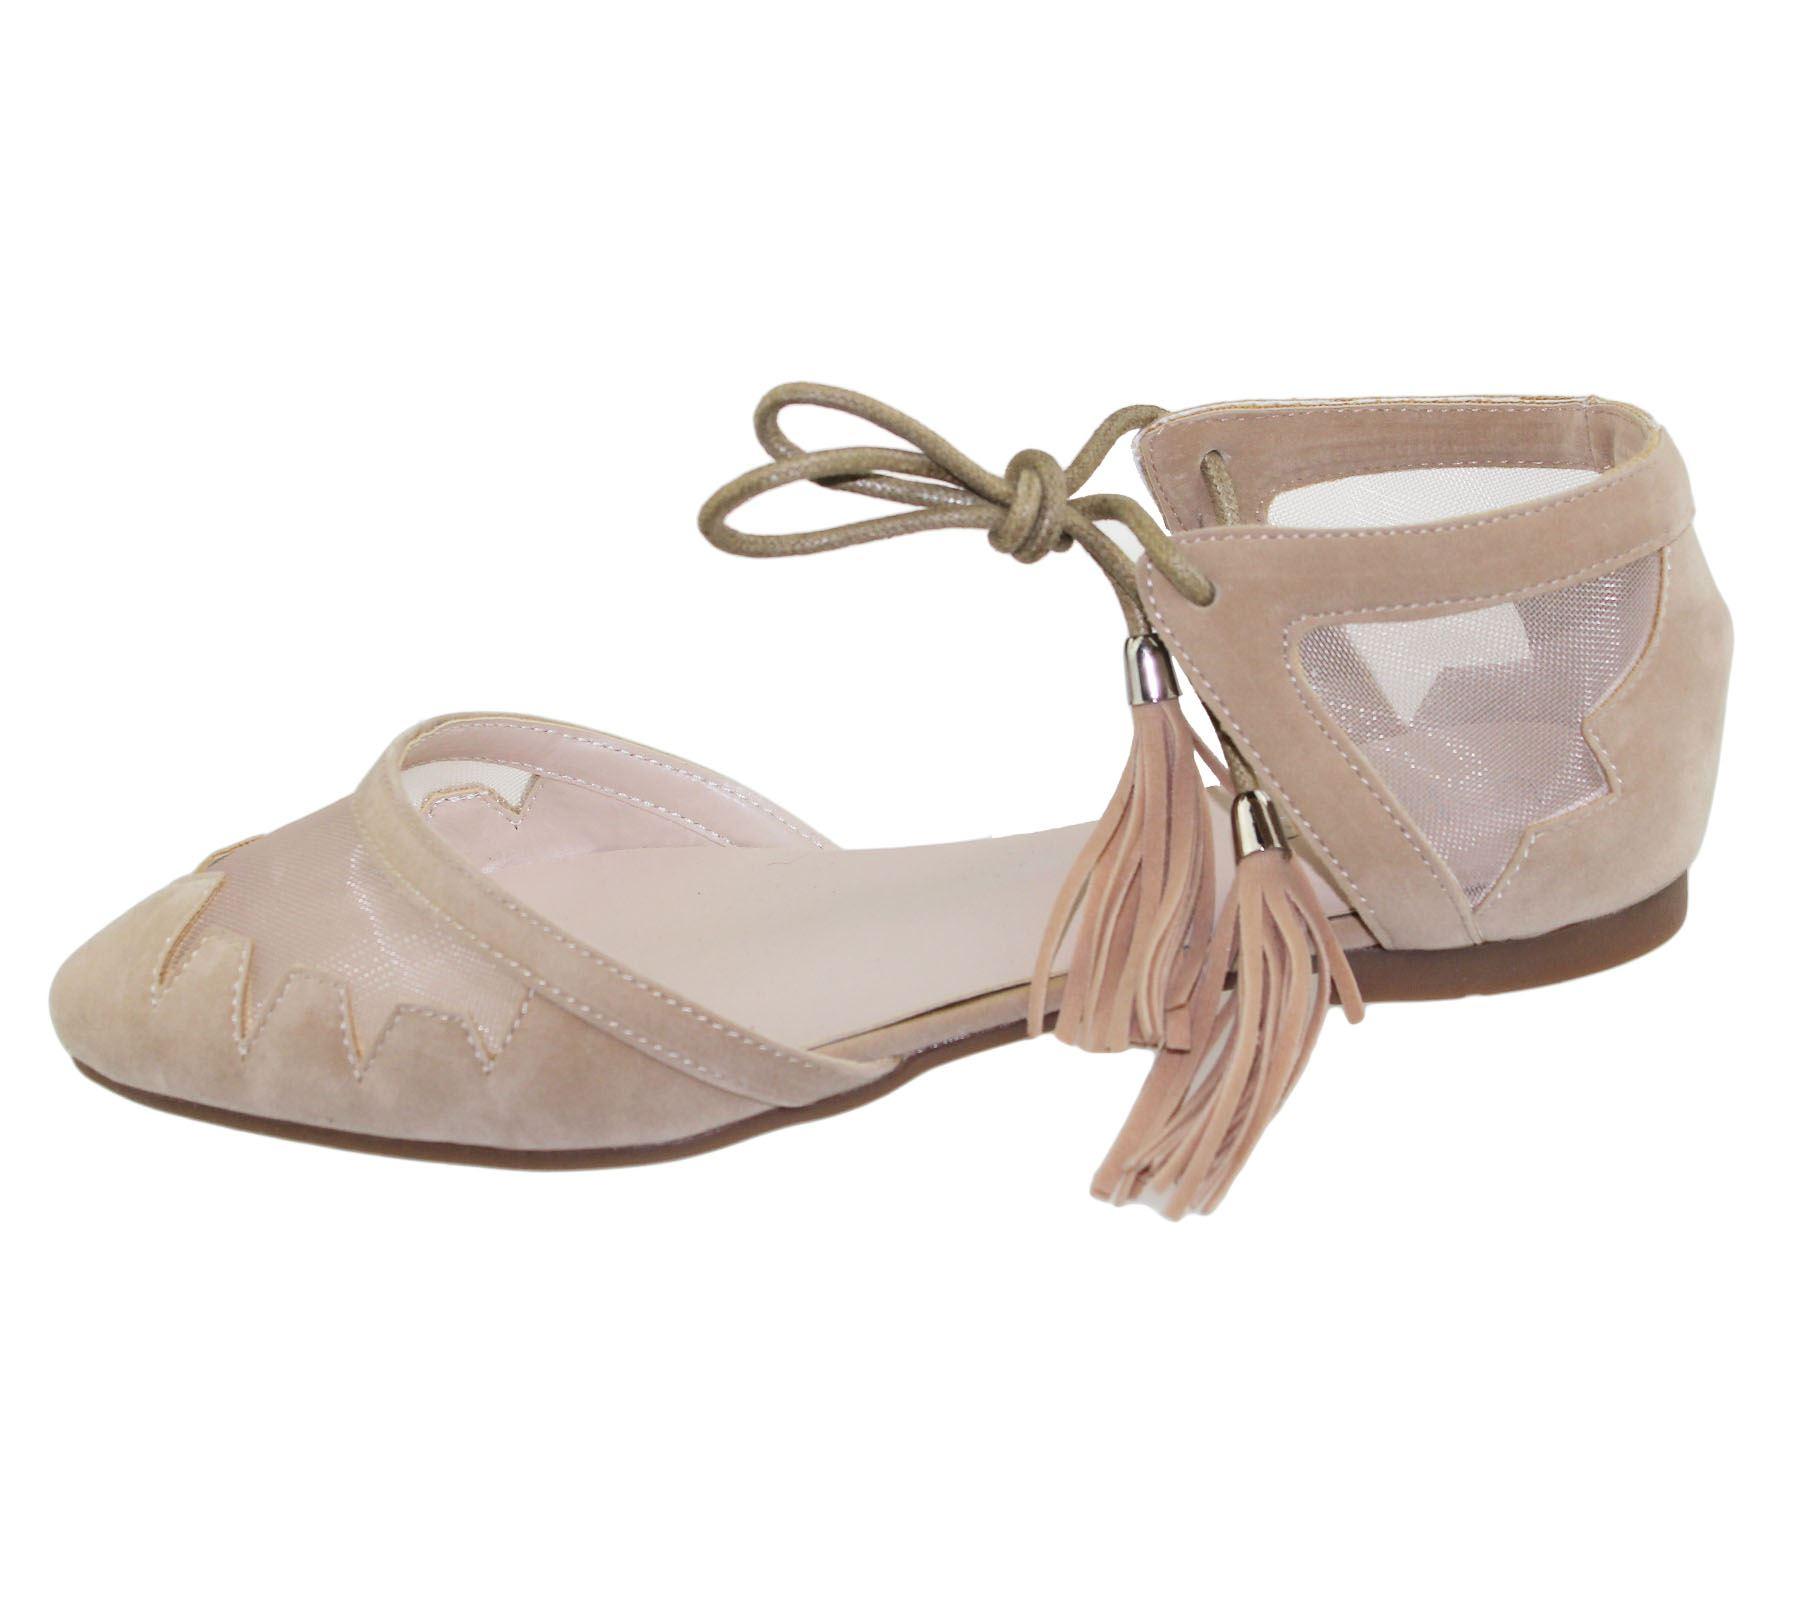 Womens-Flat-Ballerina-Dolly-Pumps-Ballet-Ladies-Summer-Mesh-Tassel-Shoes-Sandals thumbnail 9